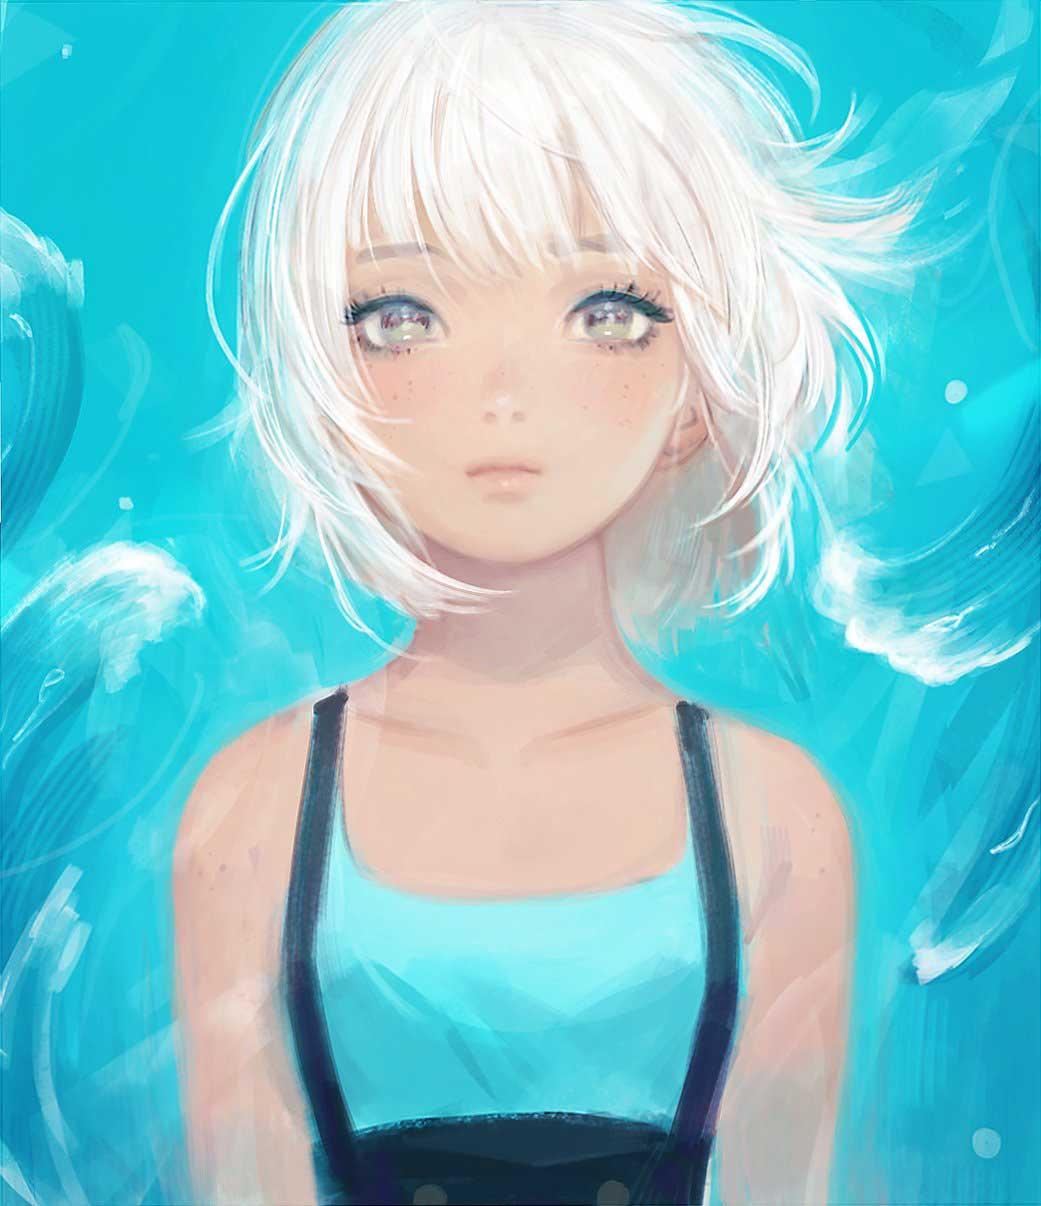 Inspirational Digital Painting entitled Waves, by Digital Artist Vioriie aka Rose